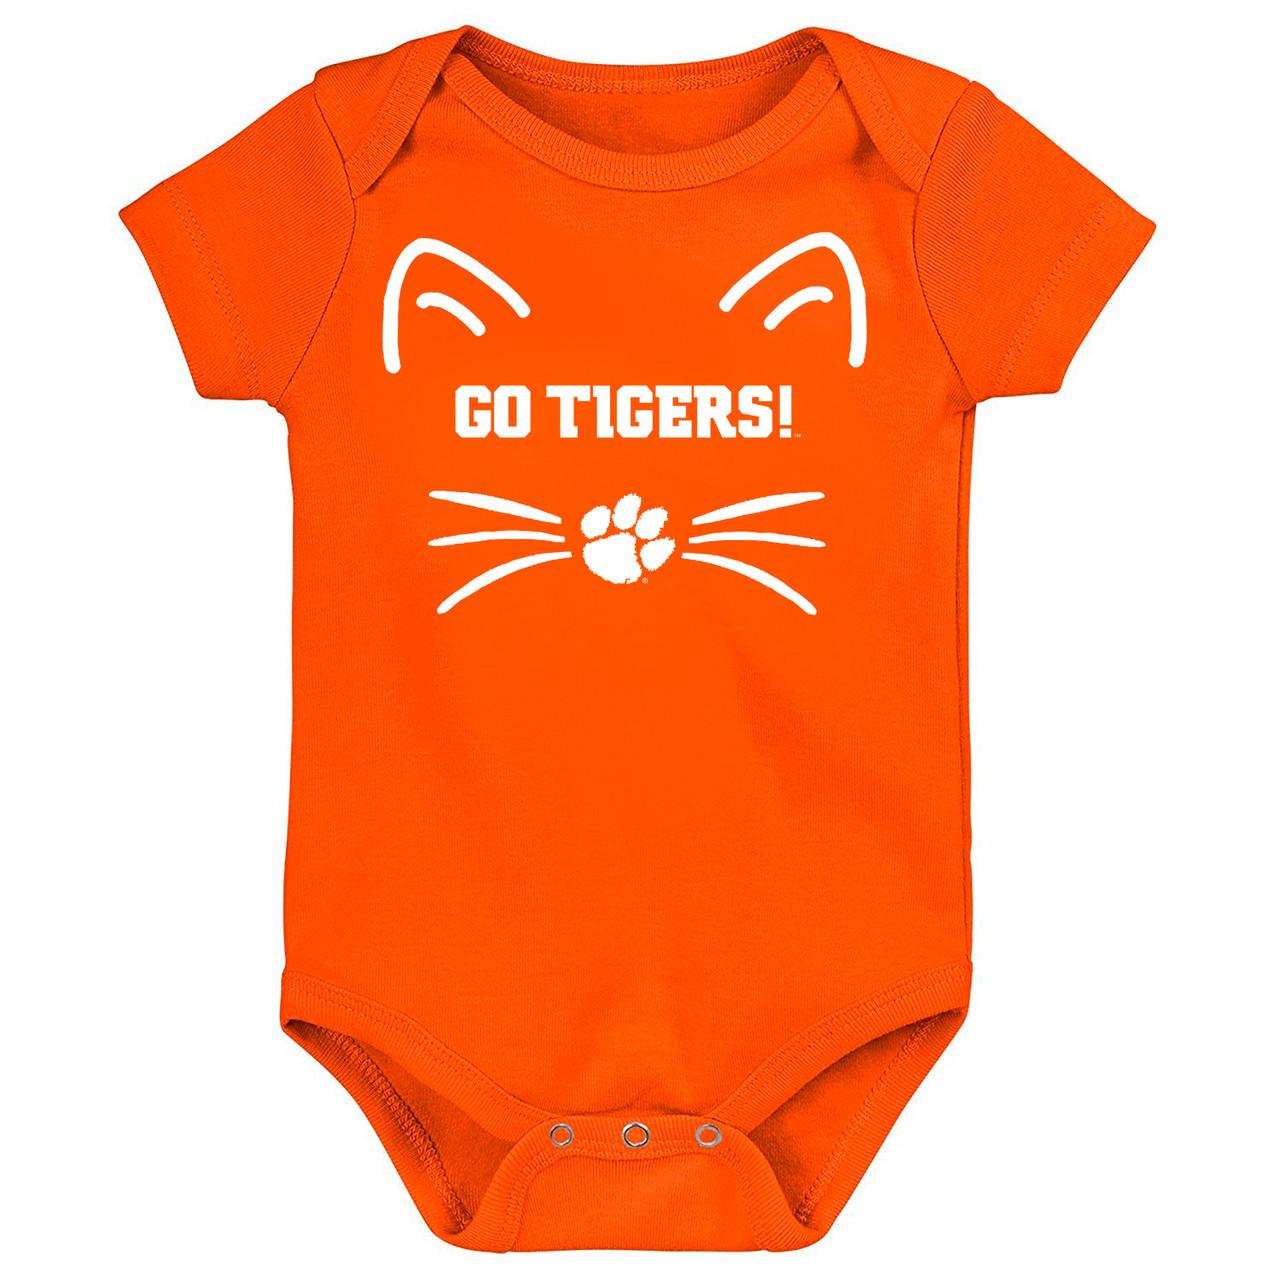 d6aab0b9c Clemson Tigers Go Tigers! Baby Bodysuit - Orange. Loading zoom